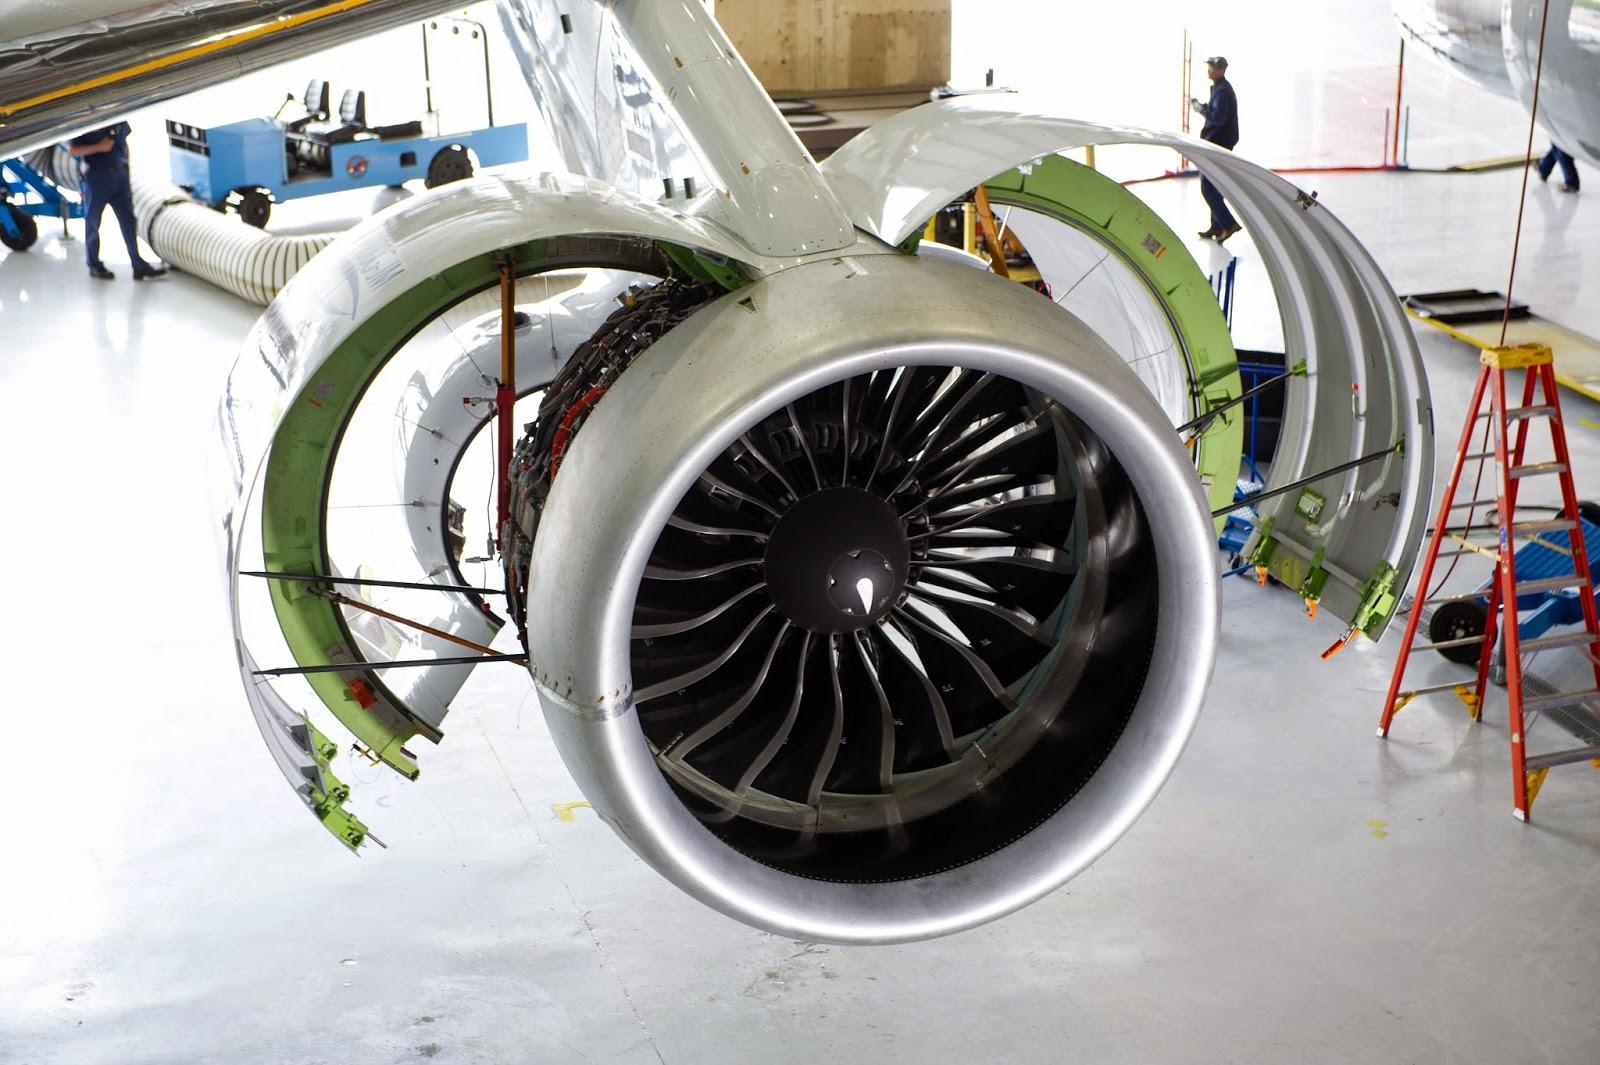 Les moteurs de l'A320neo certifiés par la FAA